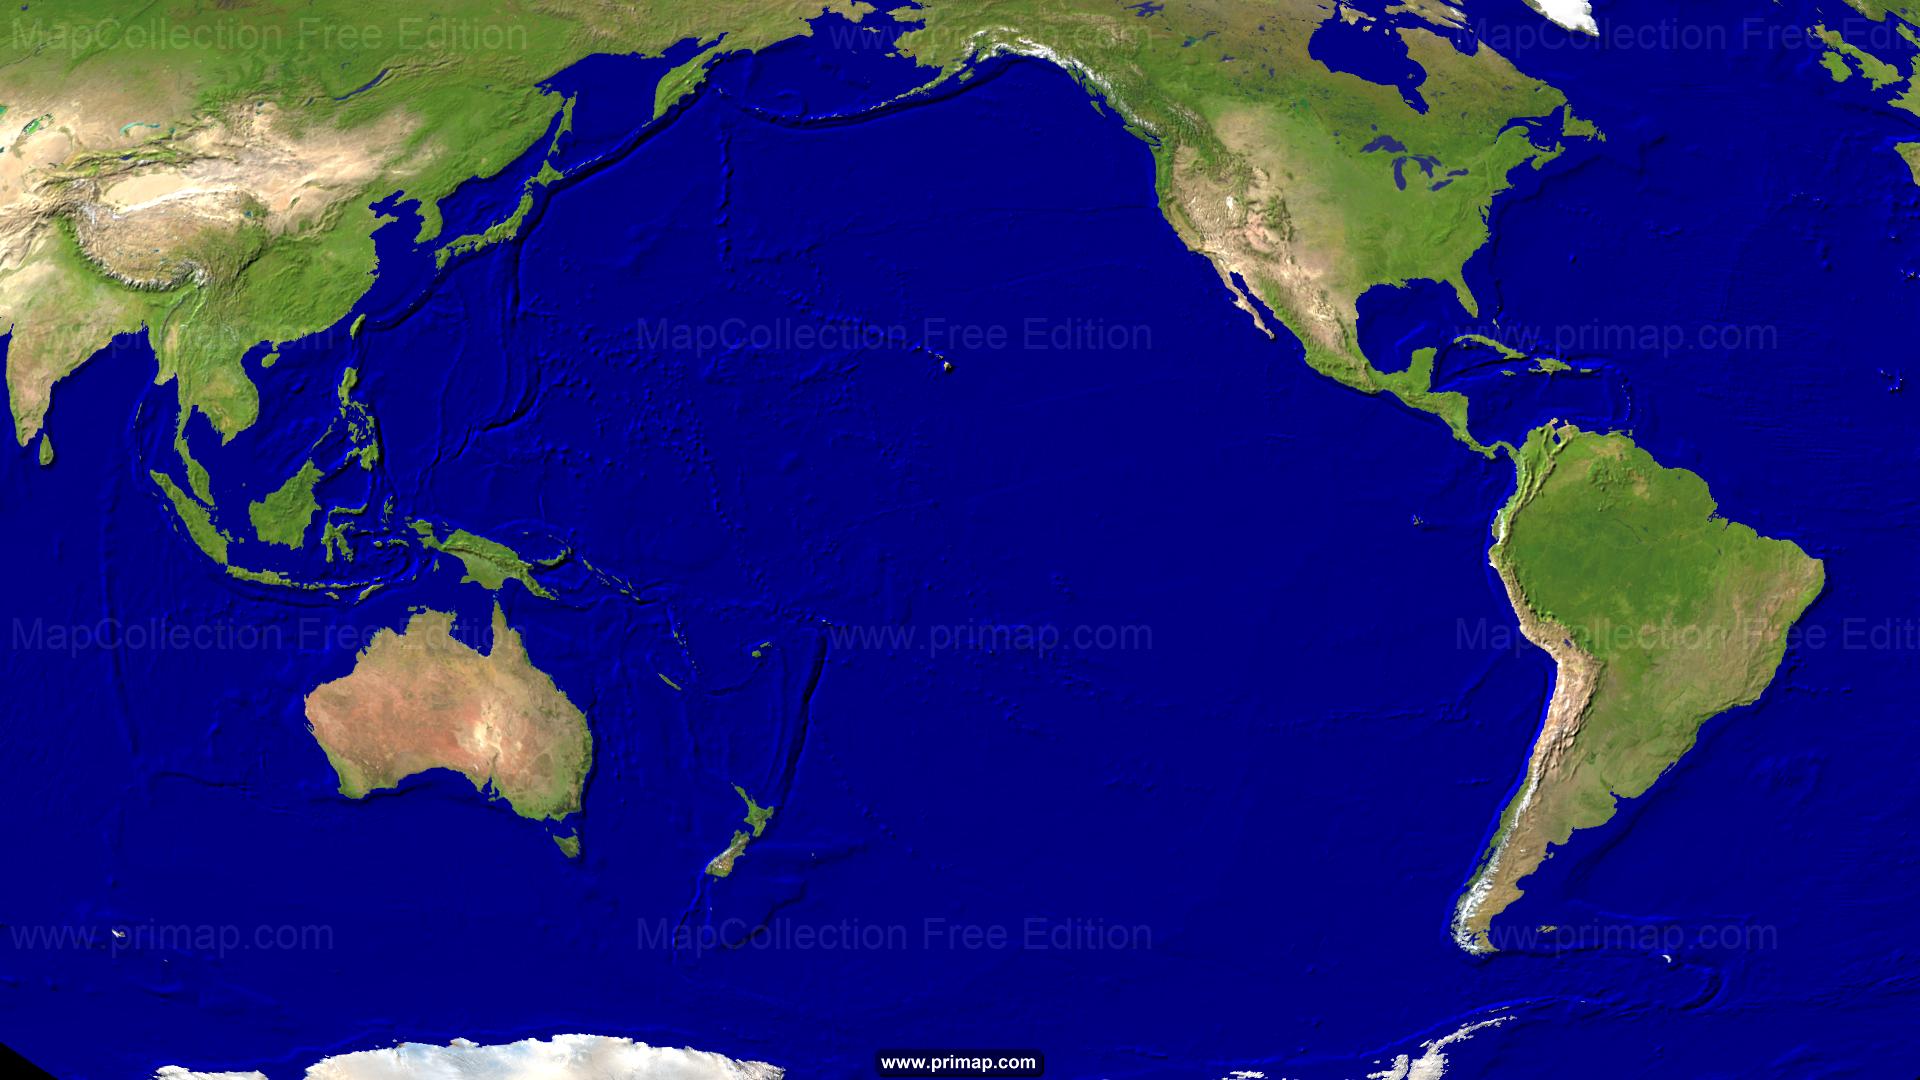 Primap marine charts free edition gumiabroncs Choice Image